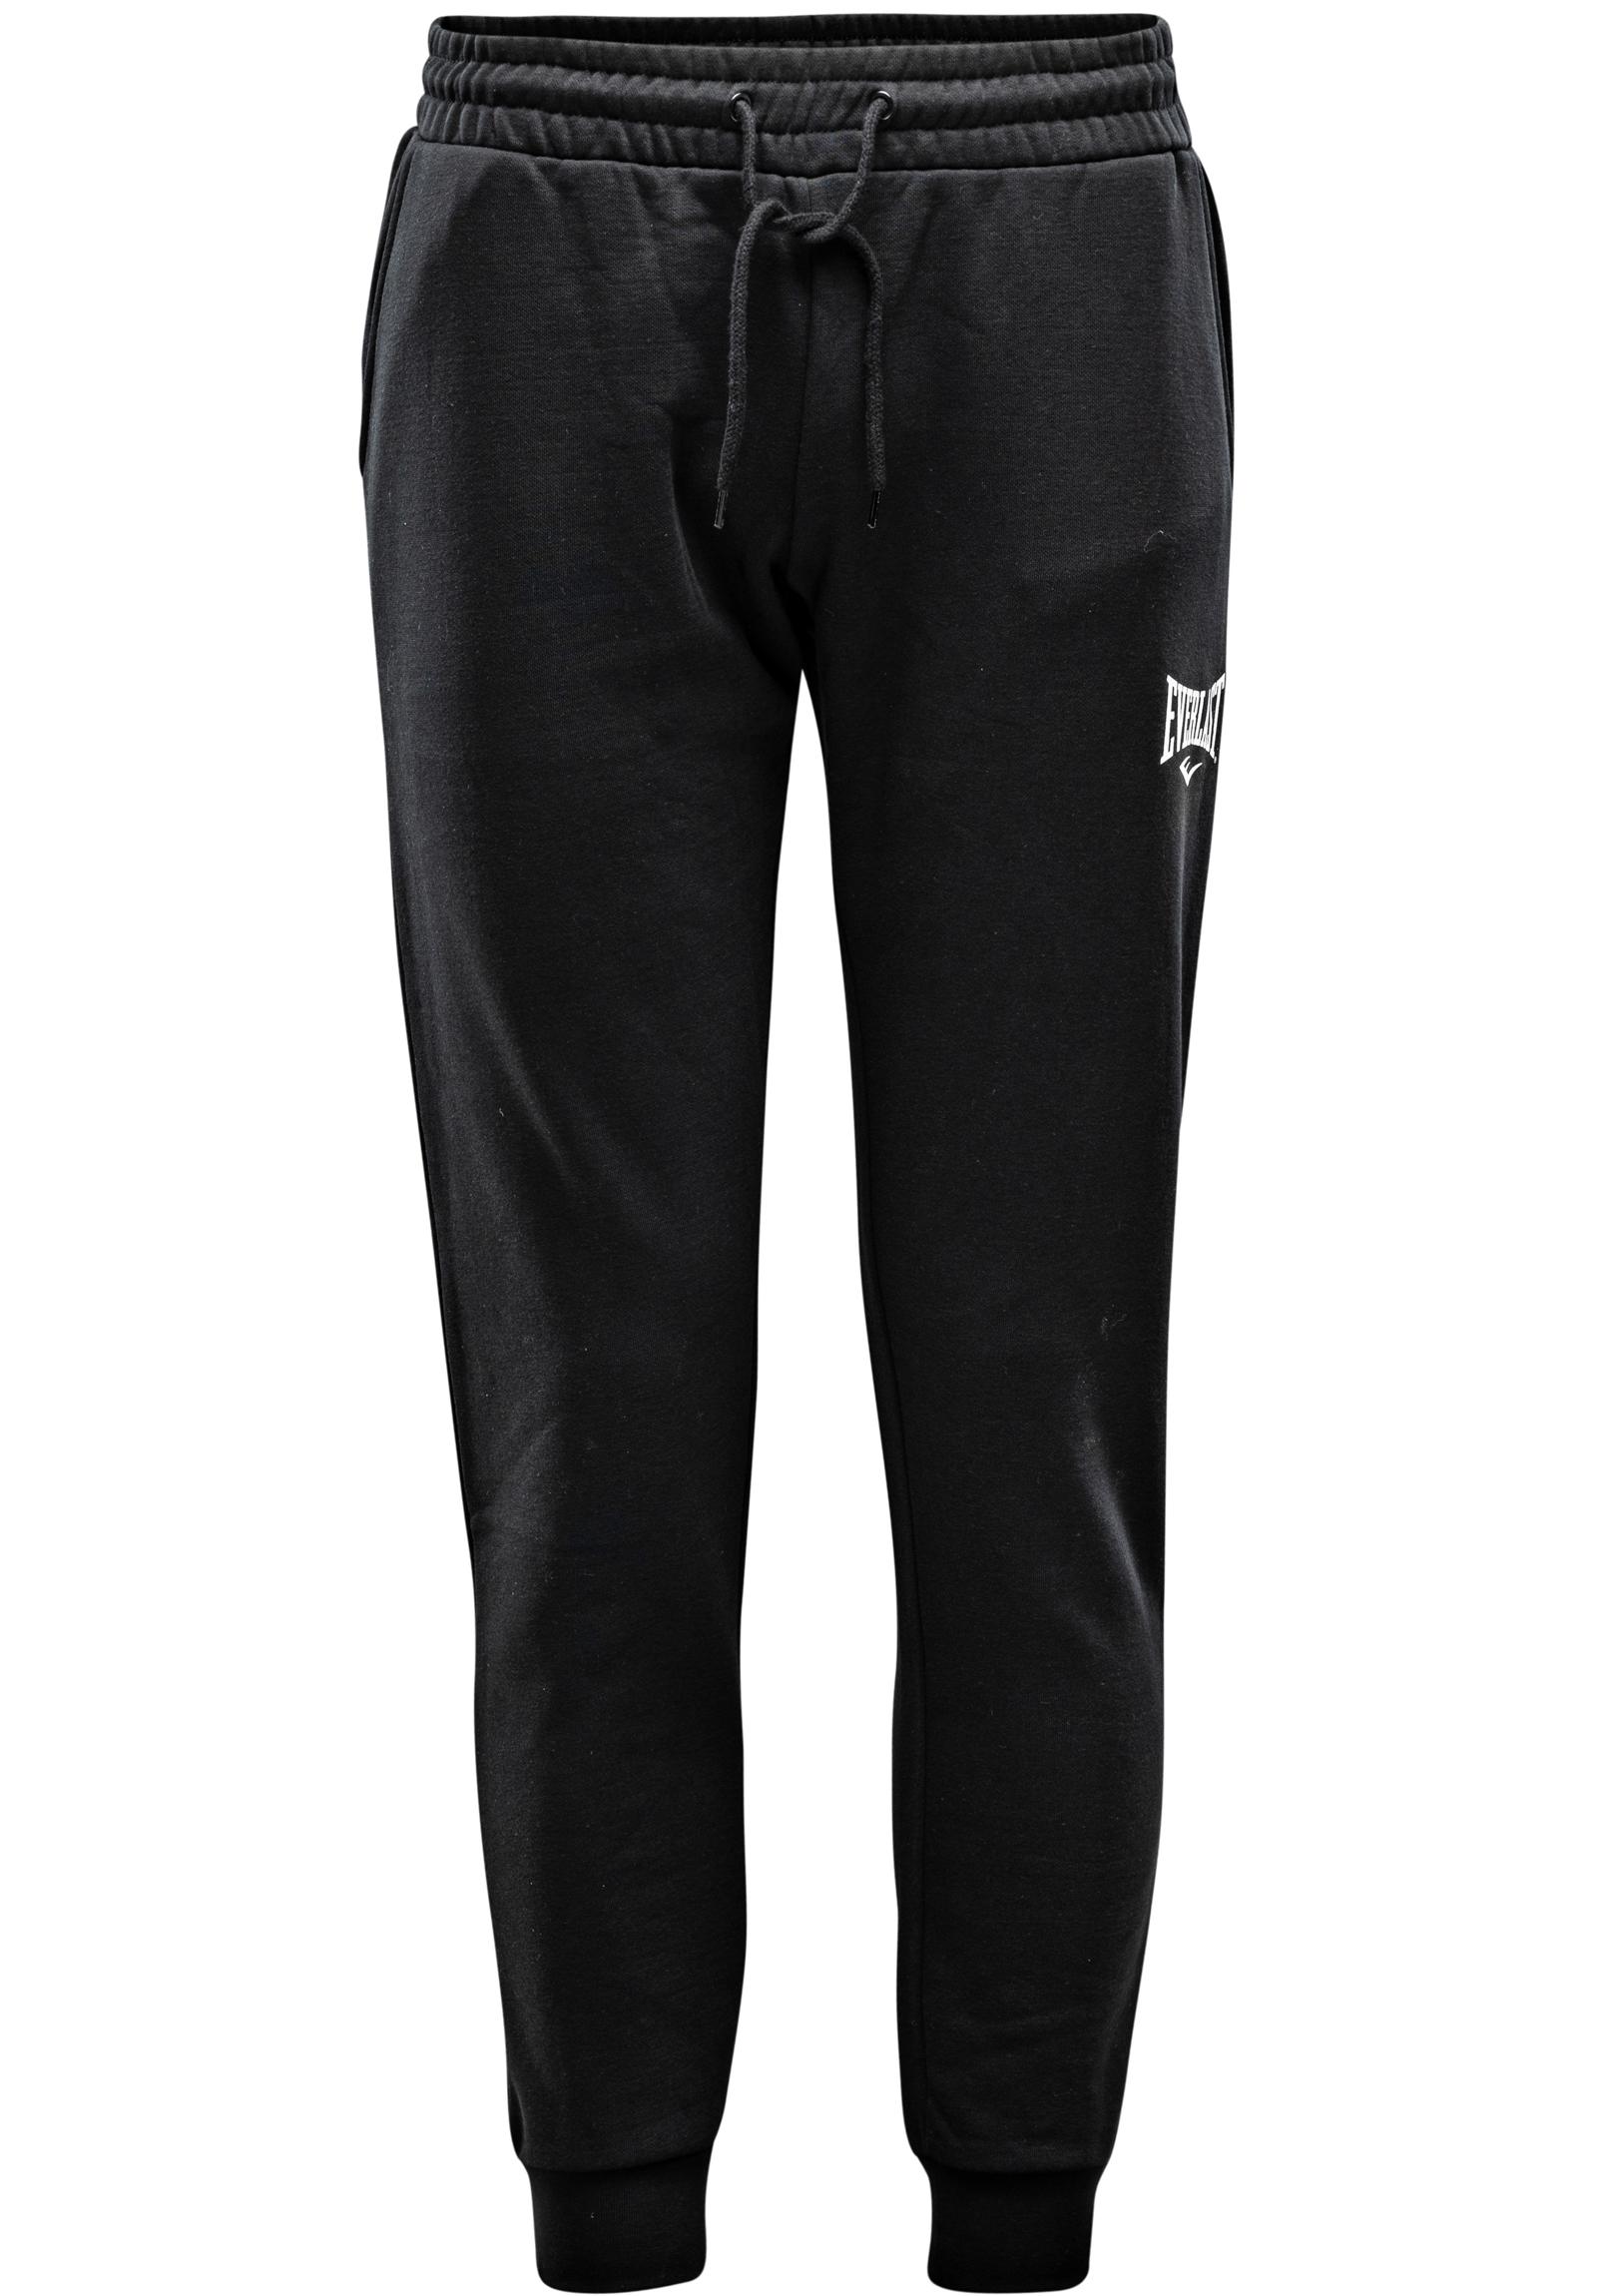 Pantalon jogging Everlast Audubon Noir